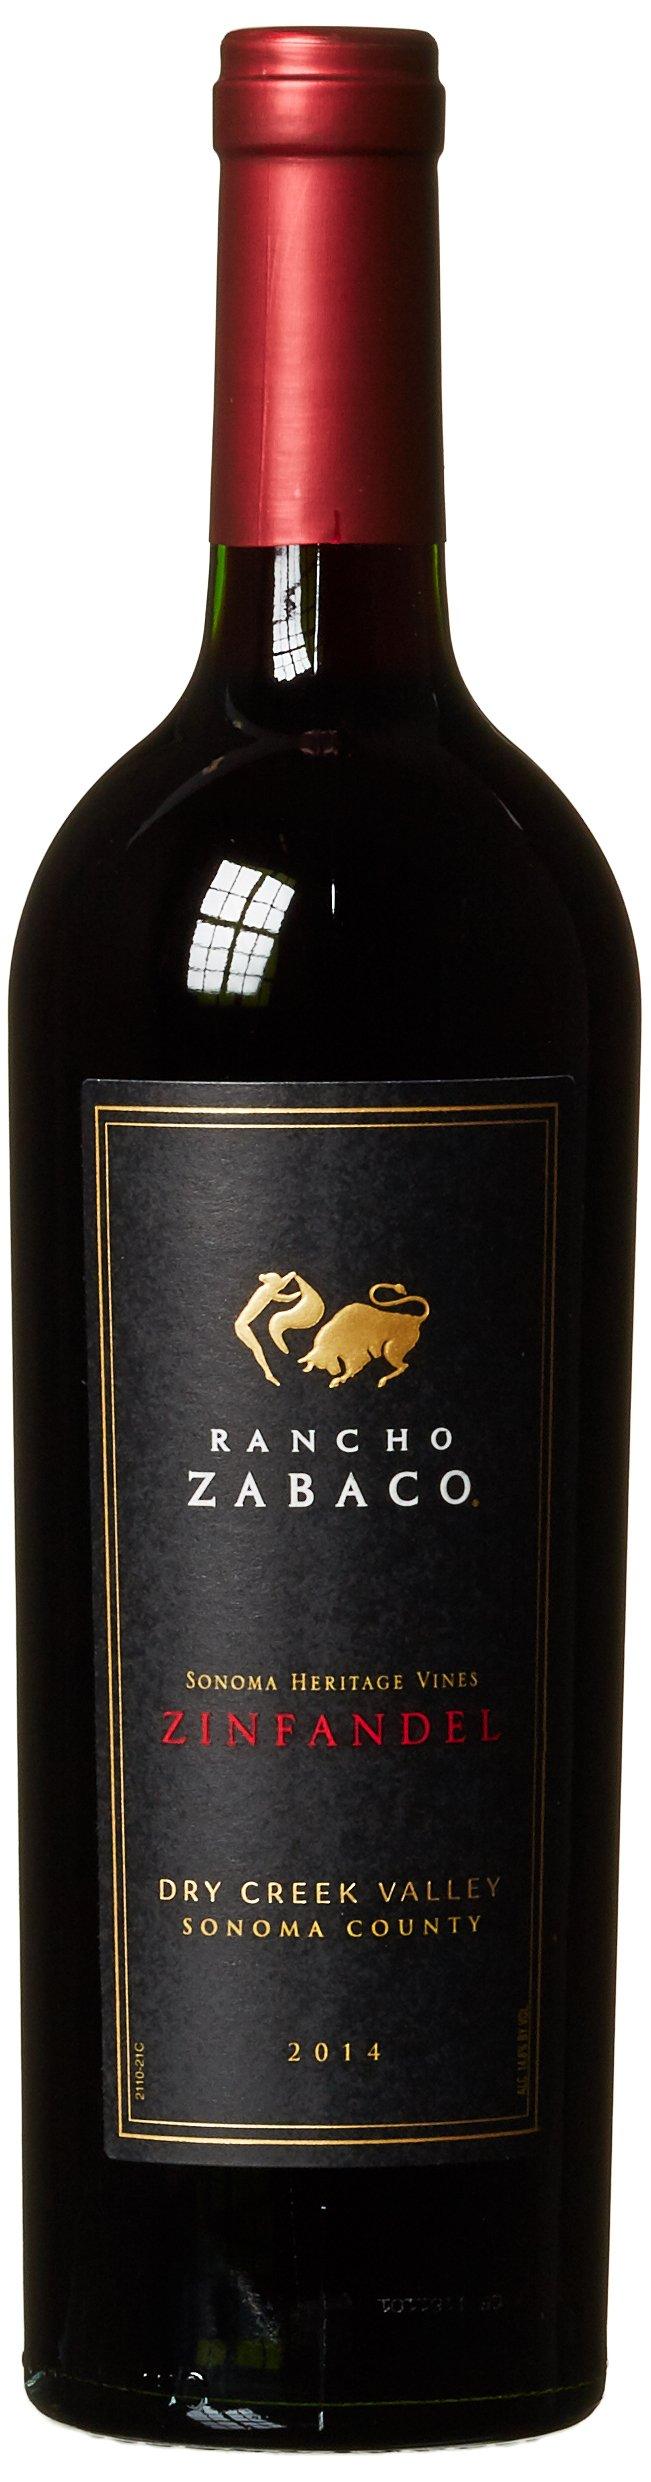 Zinfandel-Sonoma-County-Rancho-Zabaco-Heritage-Vines-2016-Trocken-1-x-075-l